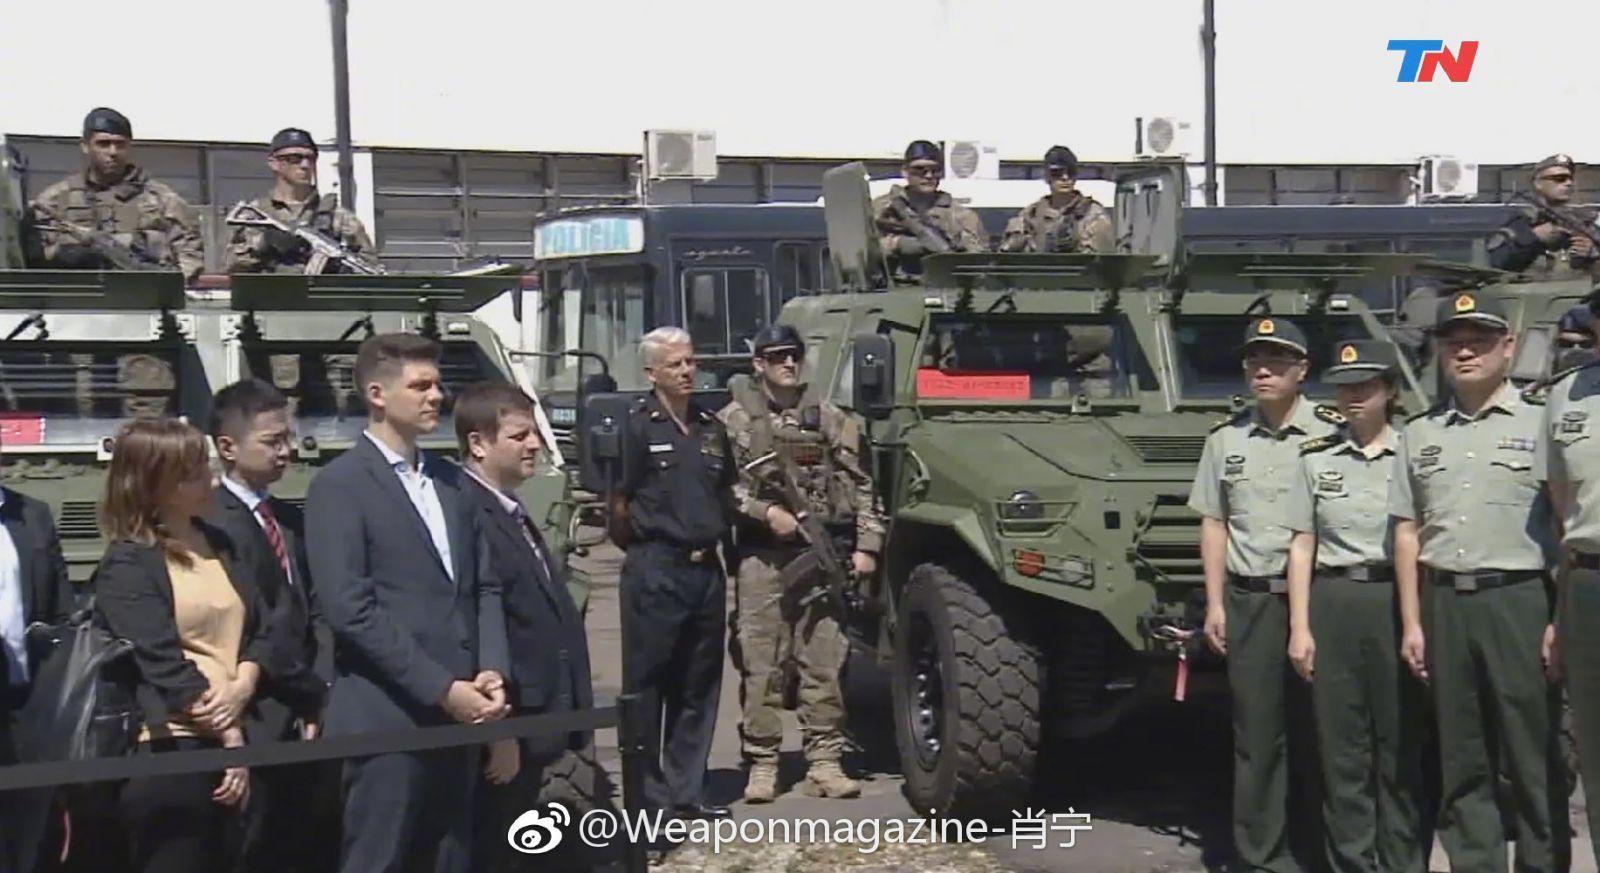 Китай оказа безвъзмездна военна помощ на Аржентина